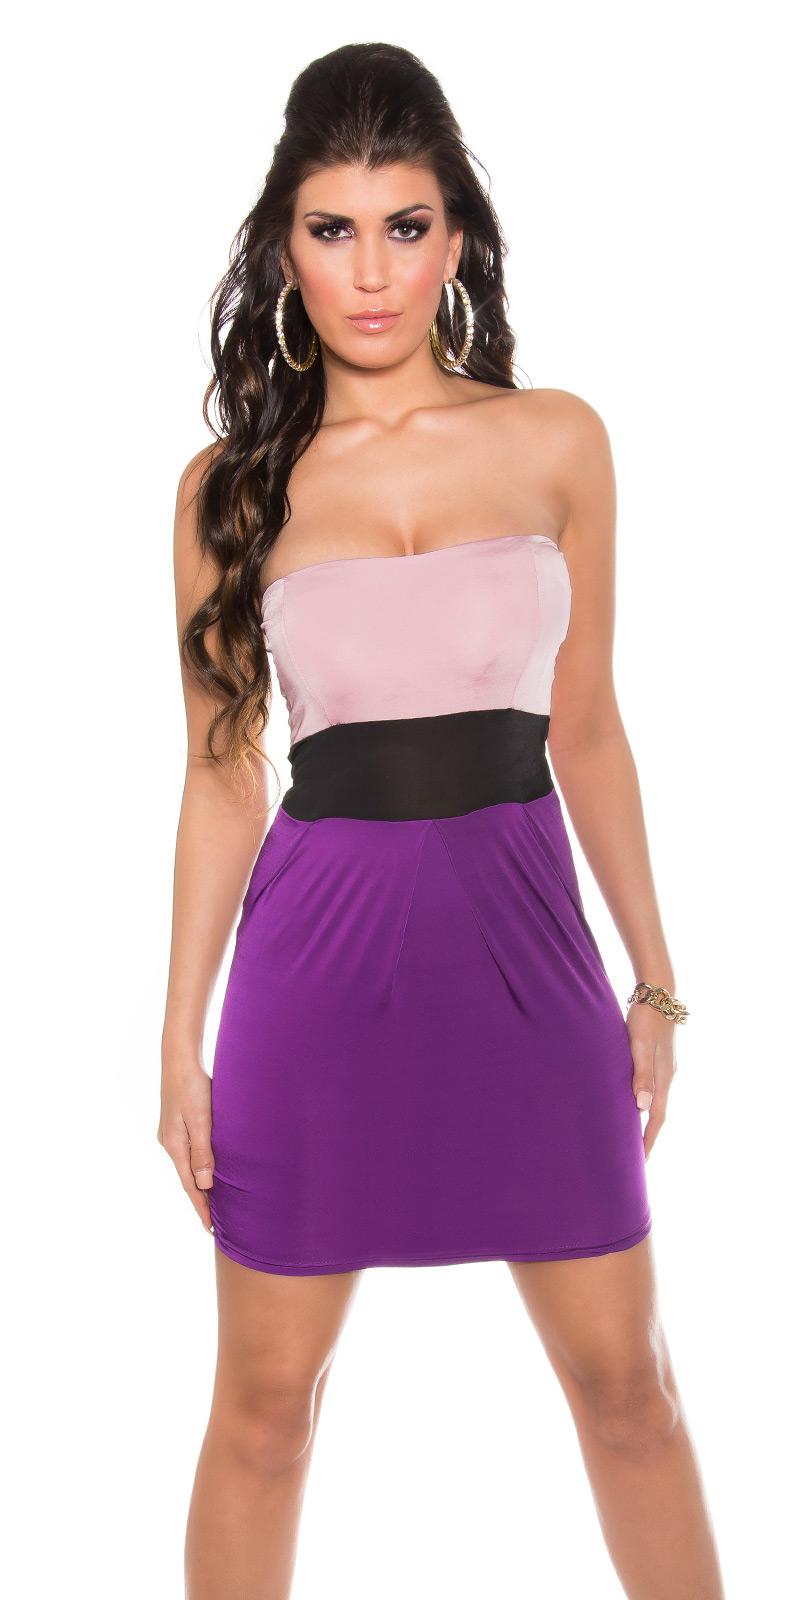 Sexy Kleid Minikleid Abendkleid Cocktailkleid Bandeaukleid Party ...